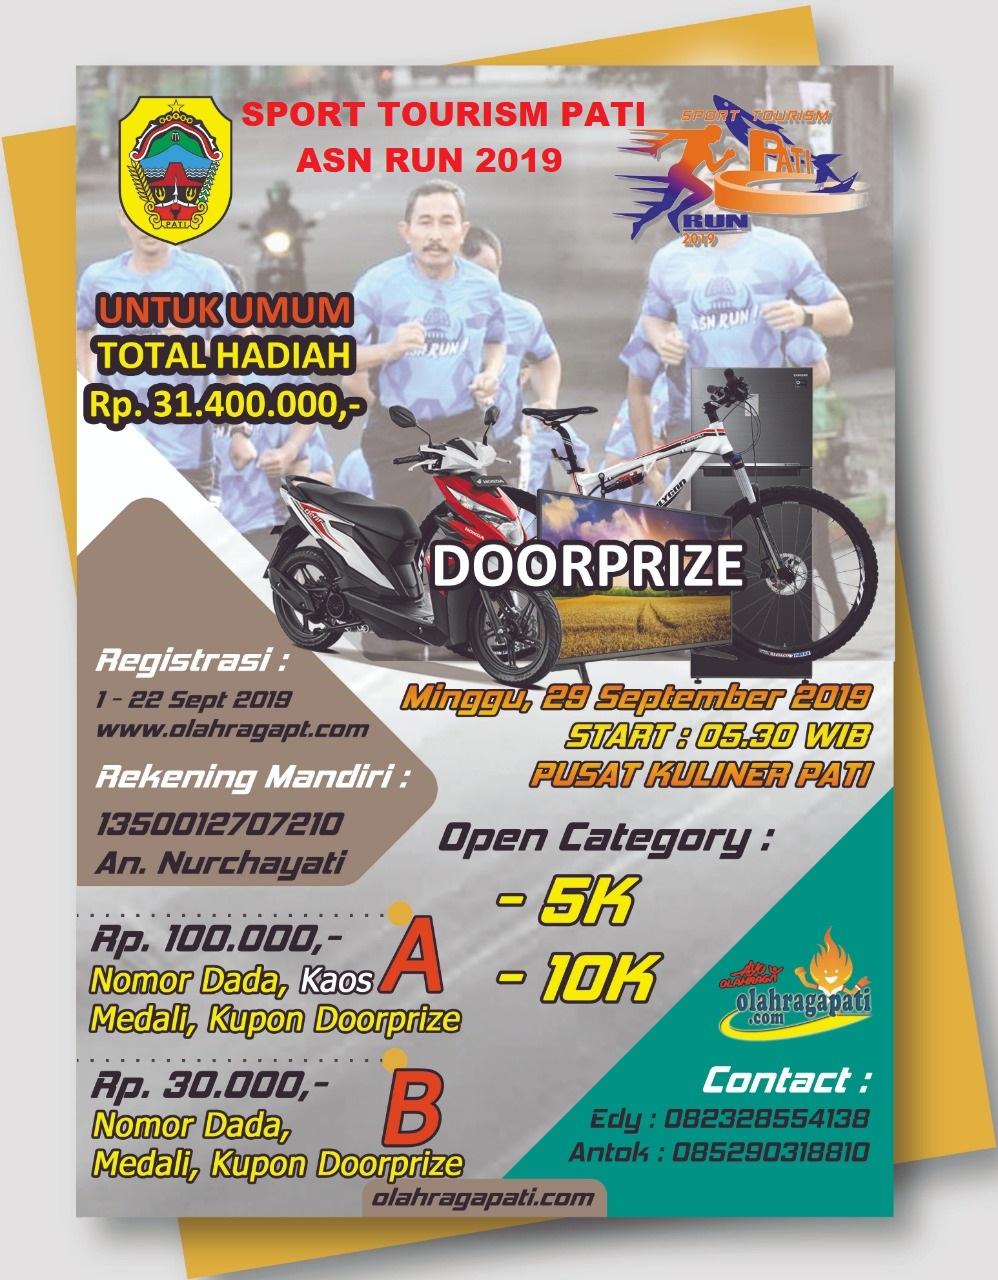 SPORT TOURISM PATI ASN RUN PATI 2019